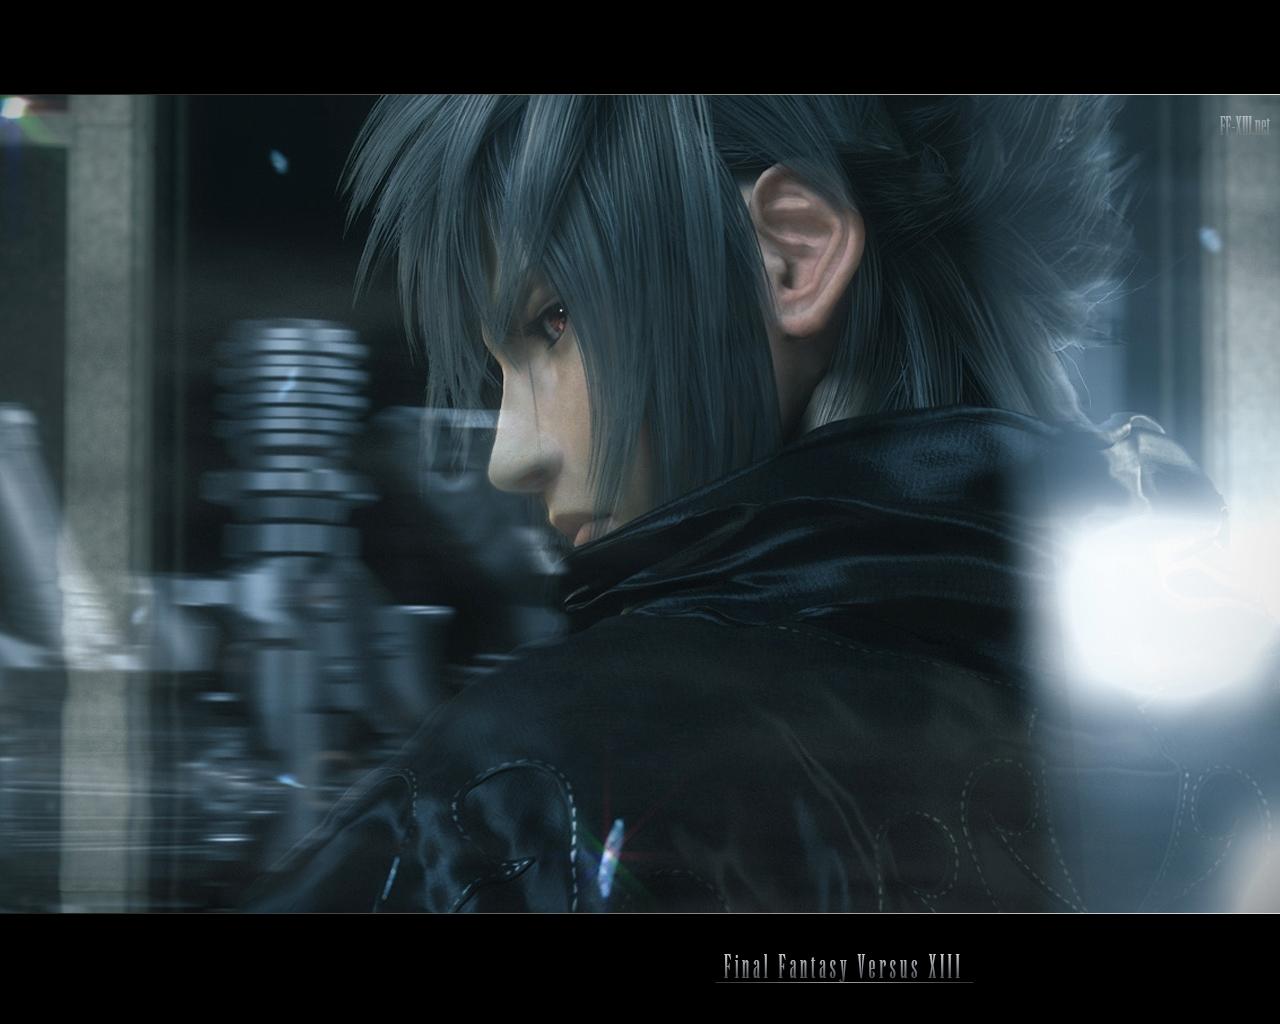 Final Fantasy Versus Xii Official Wallpaper